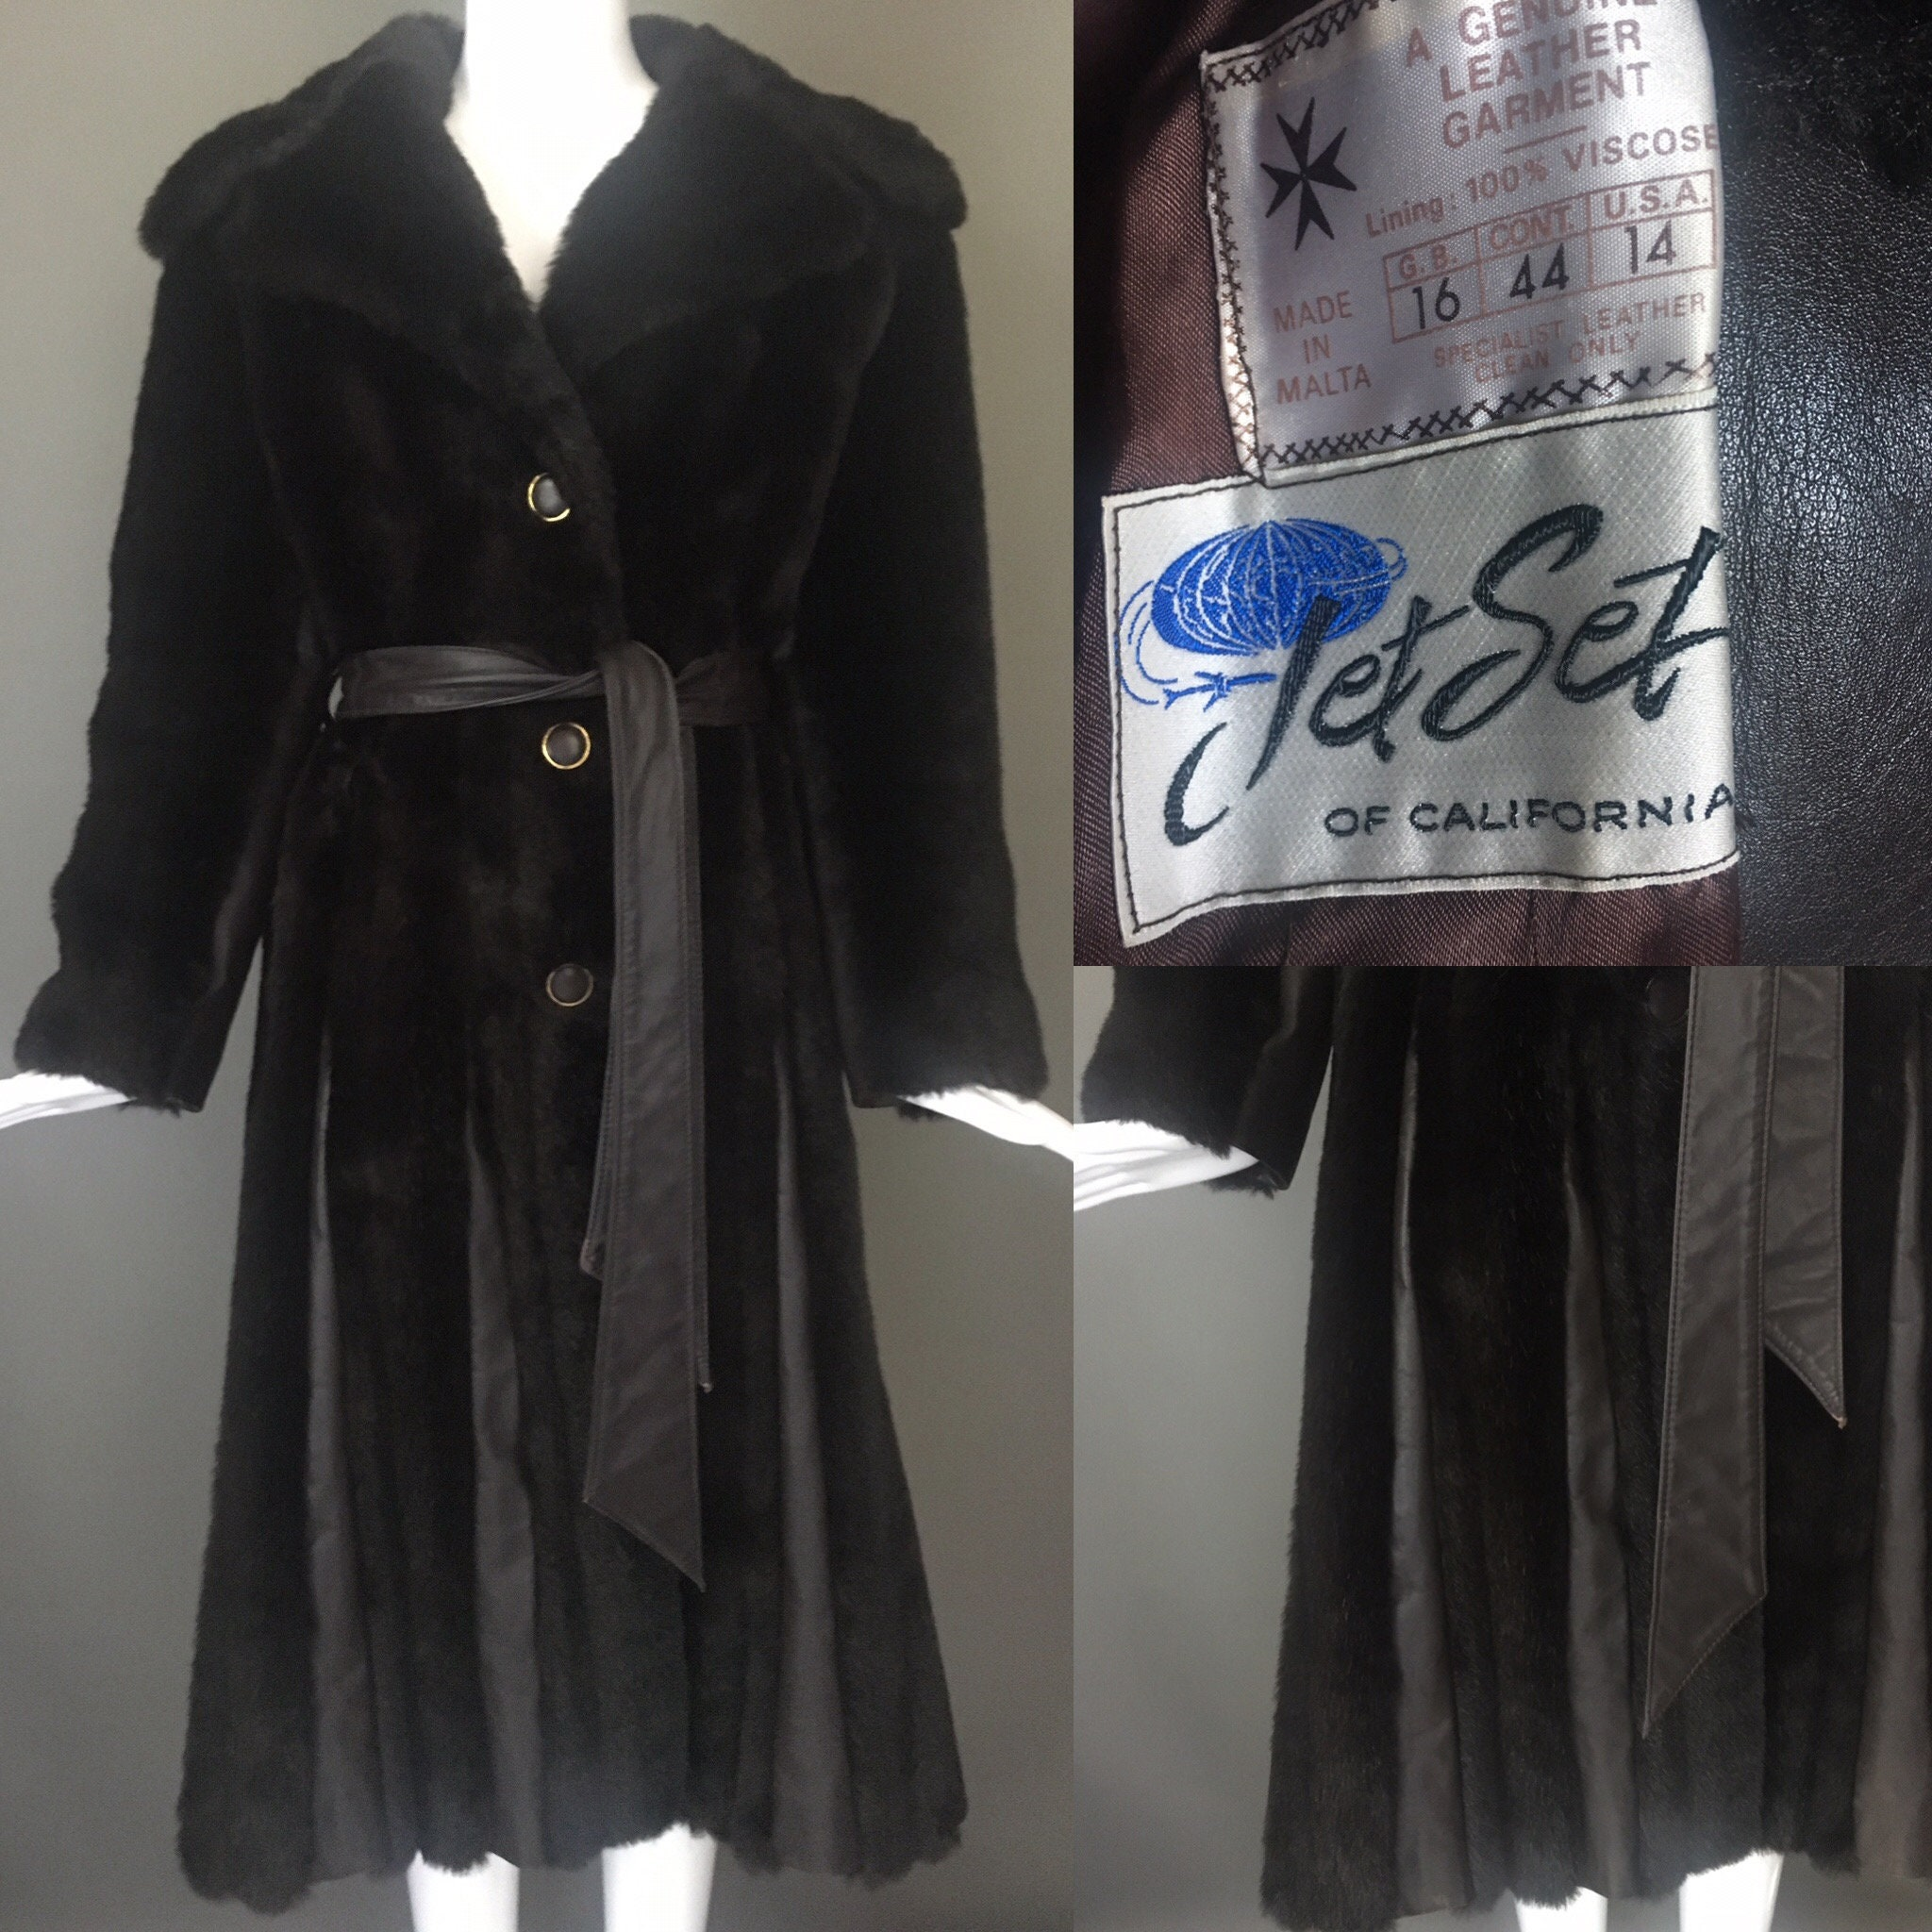 Vtg 60s Mahogany Princess Flare Spy Coat Faux Mink 70 inch Sweep Genuine Leather Stripes Matching Leather Belt S M Jet Set Mint